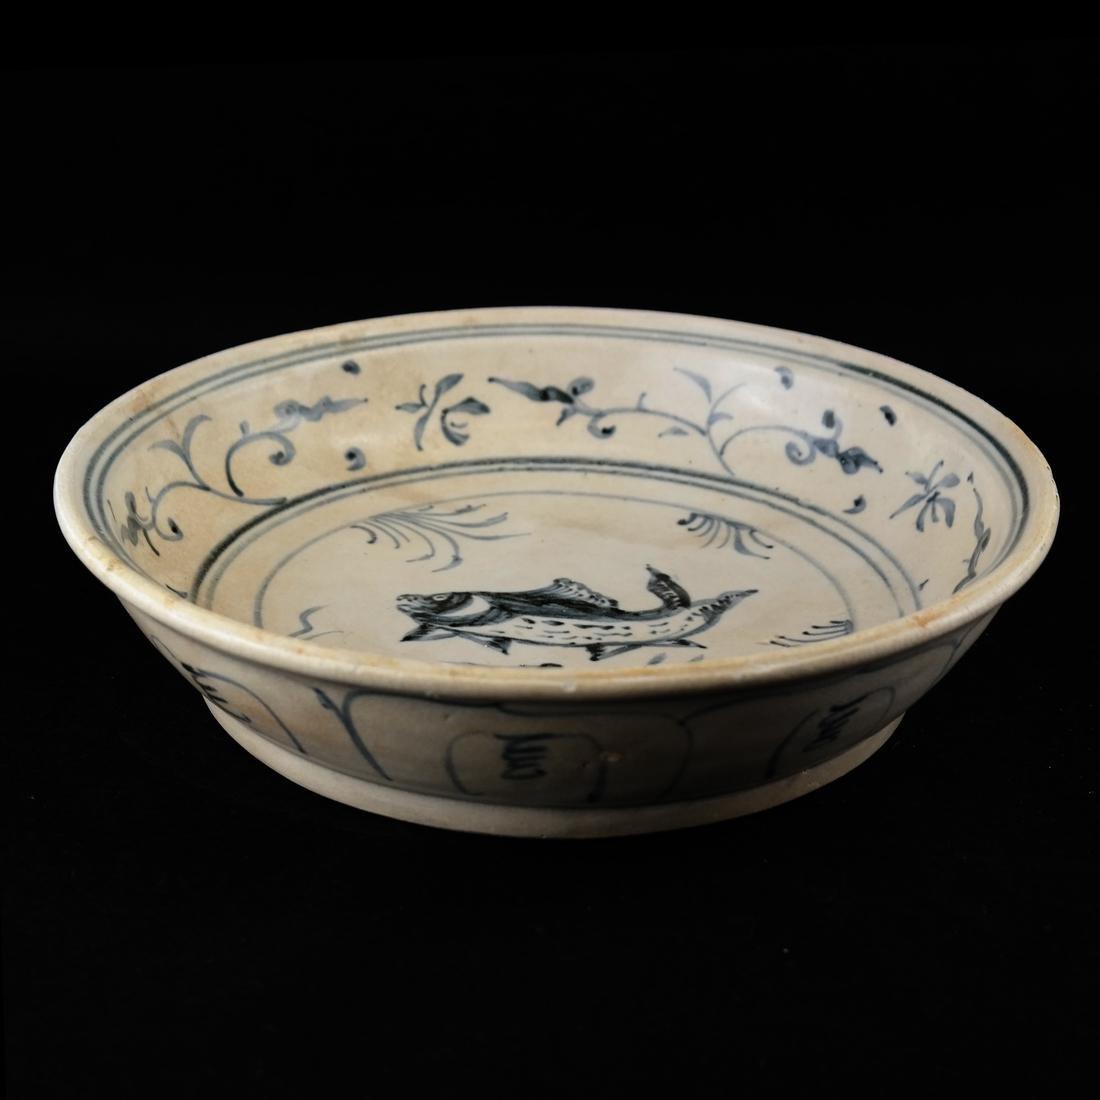 Early Chinese Blue & White Ceramic Dish